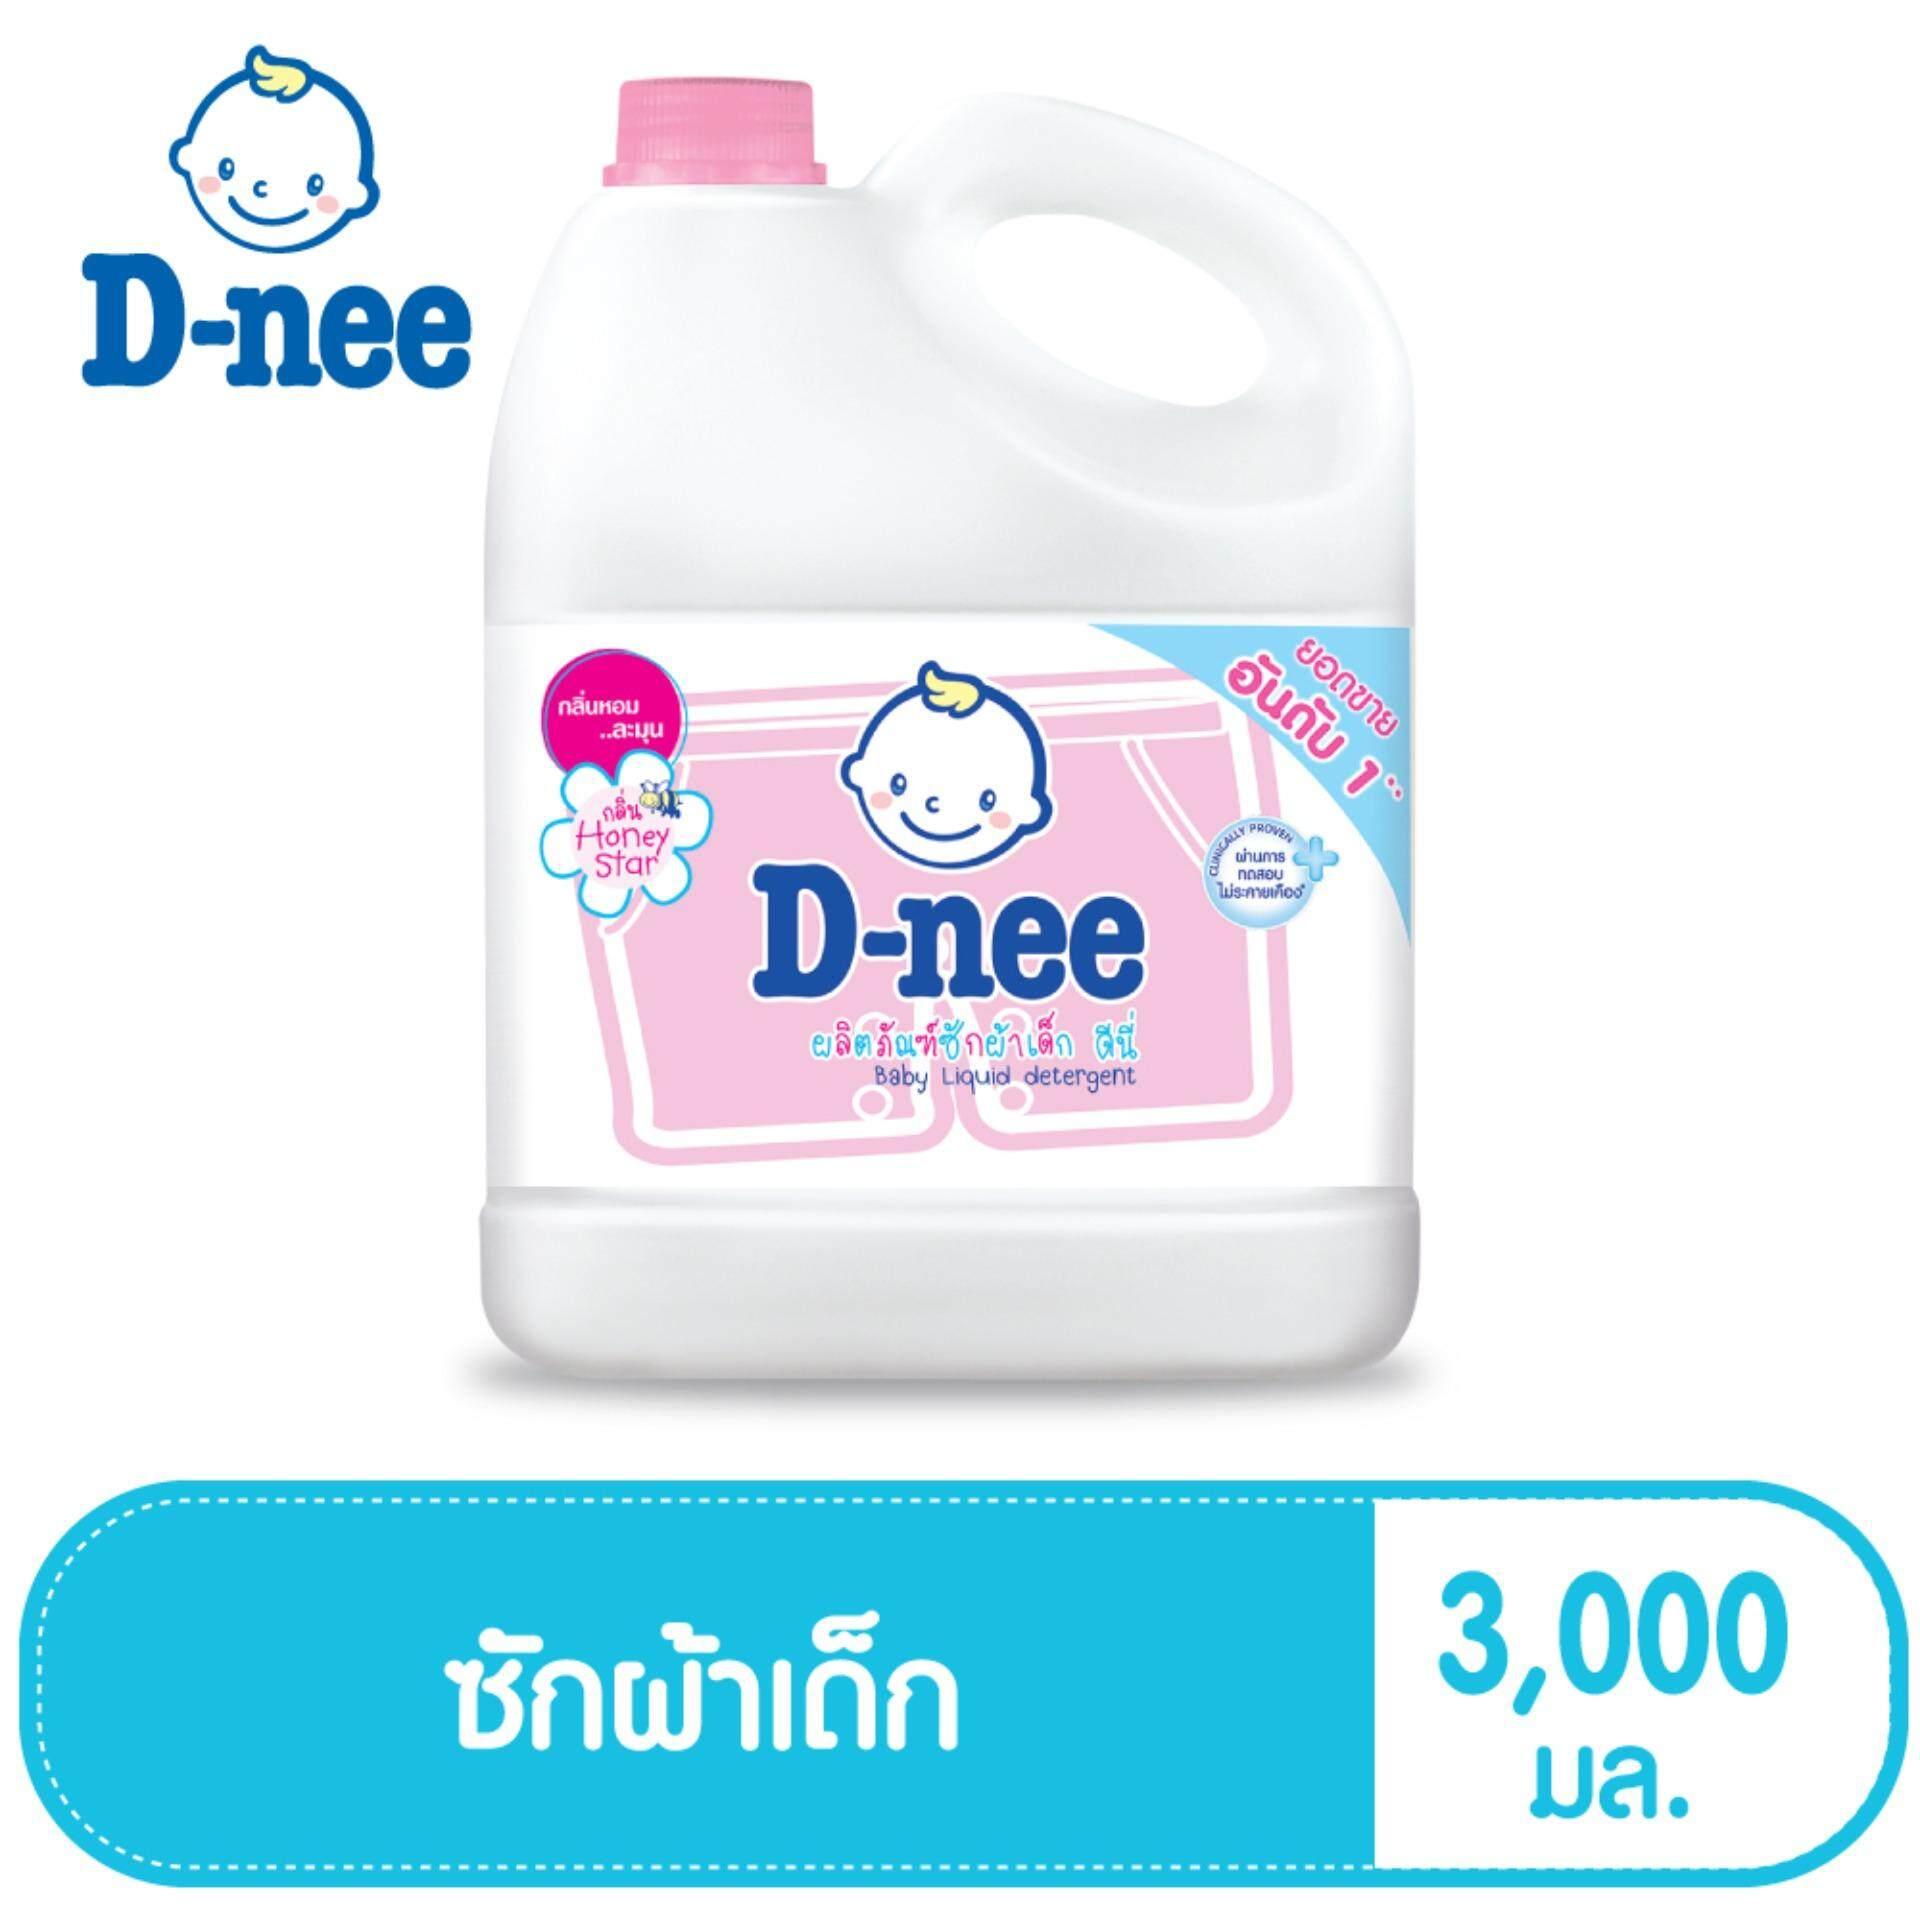 D-Nee น้ำยาซักผ้าเด็ก แบบแกลลอน ขนาด 3000 มล. (สีชมพู) By Lazada Retail D-Nee.